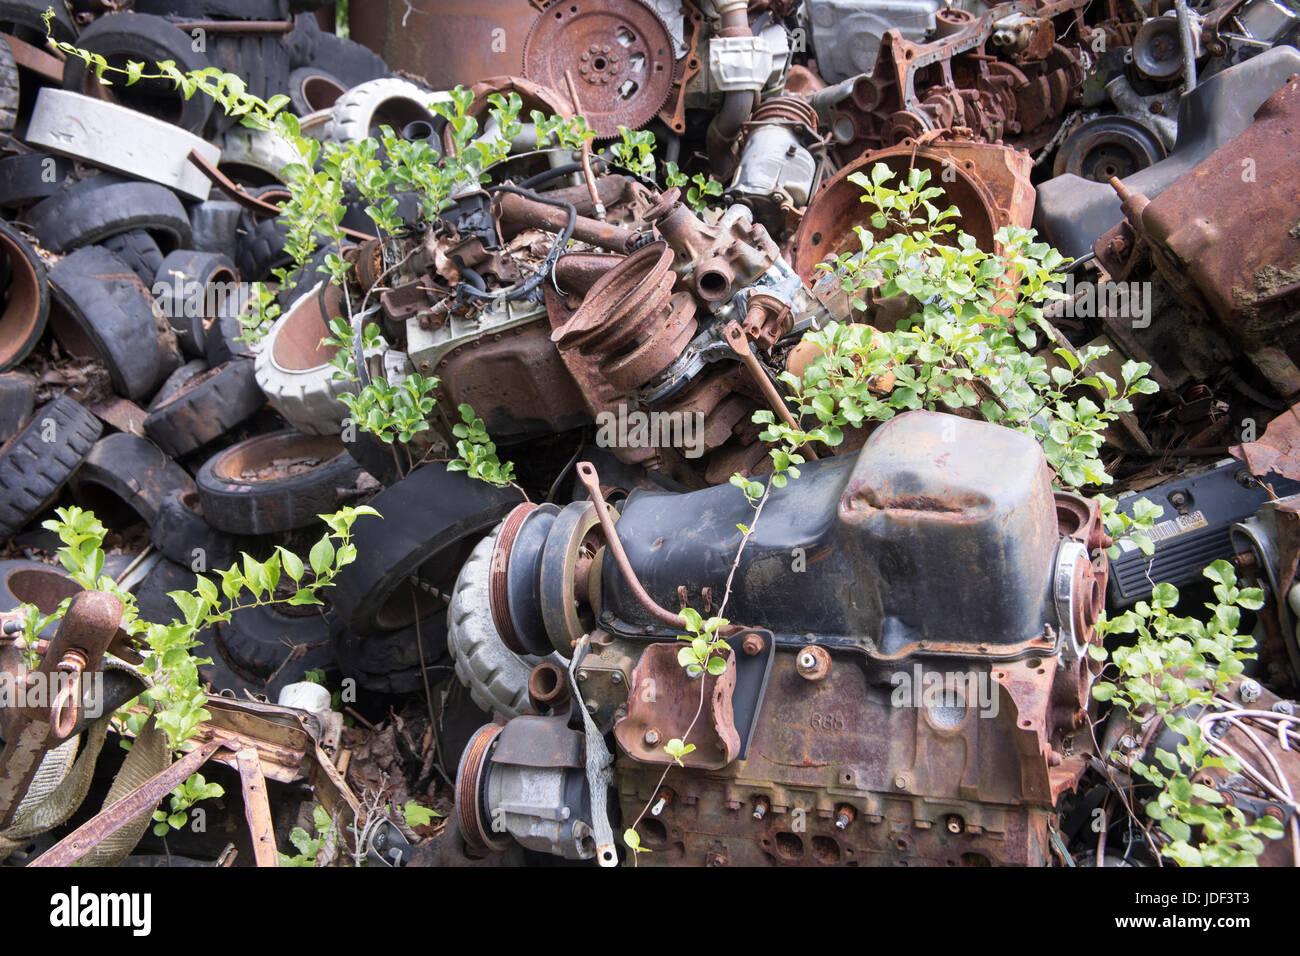 Rusting scrap metal from old cars and equipment in junkyard Stock ...